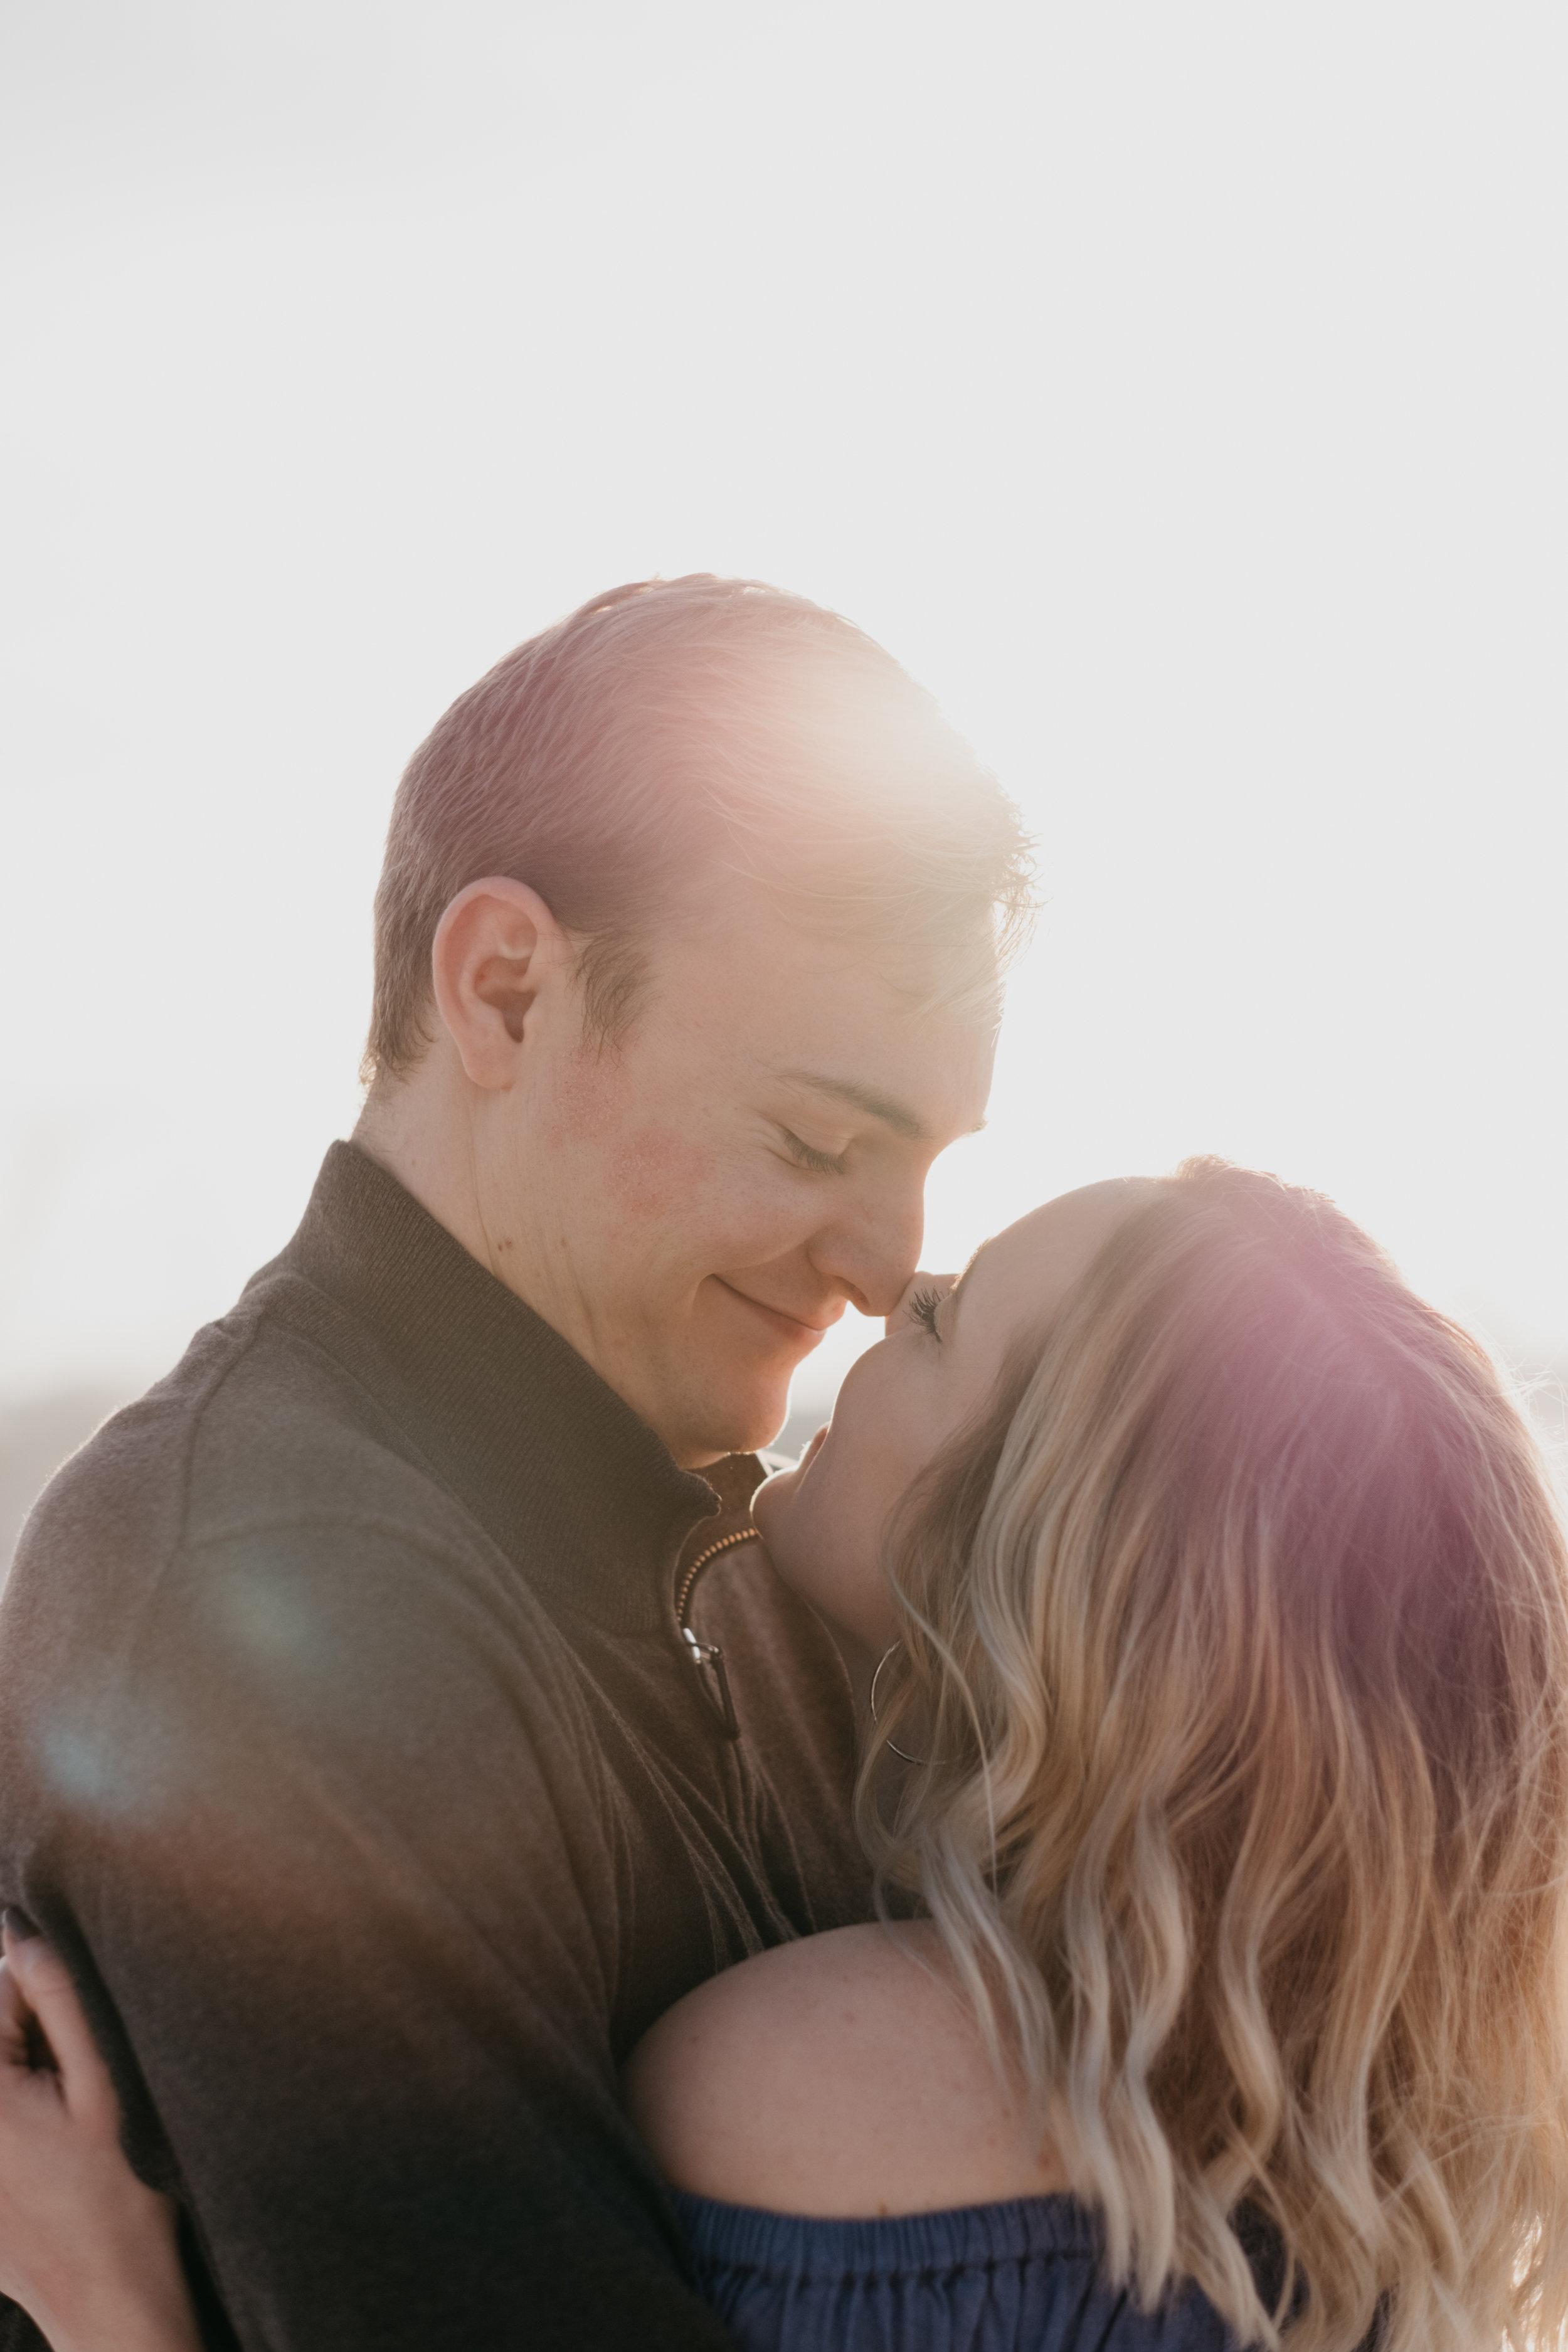 Talia + Brendan | Engagement Photography | Sioux Falls, South Dakota Photographer-22.jpg